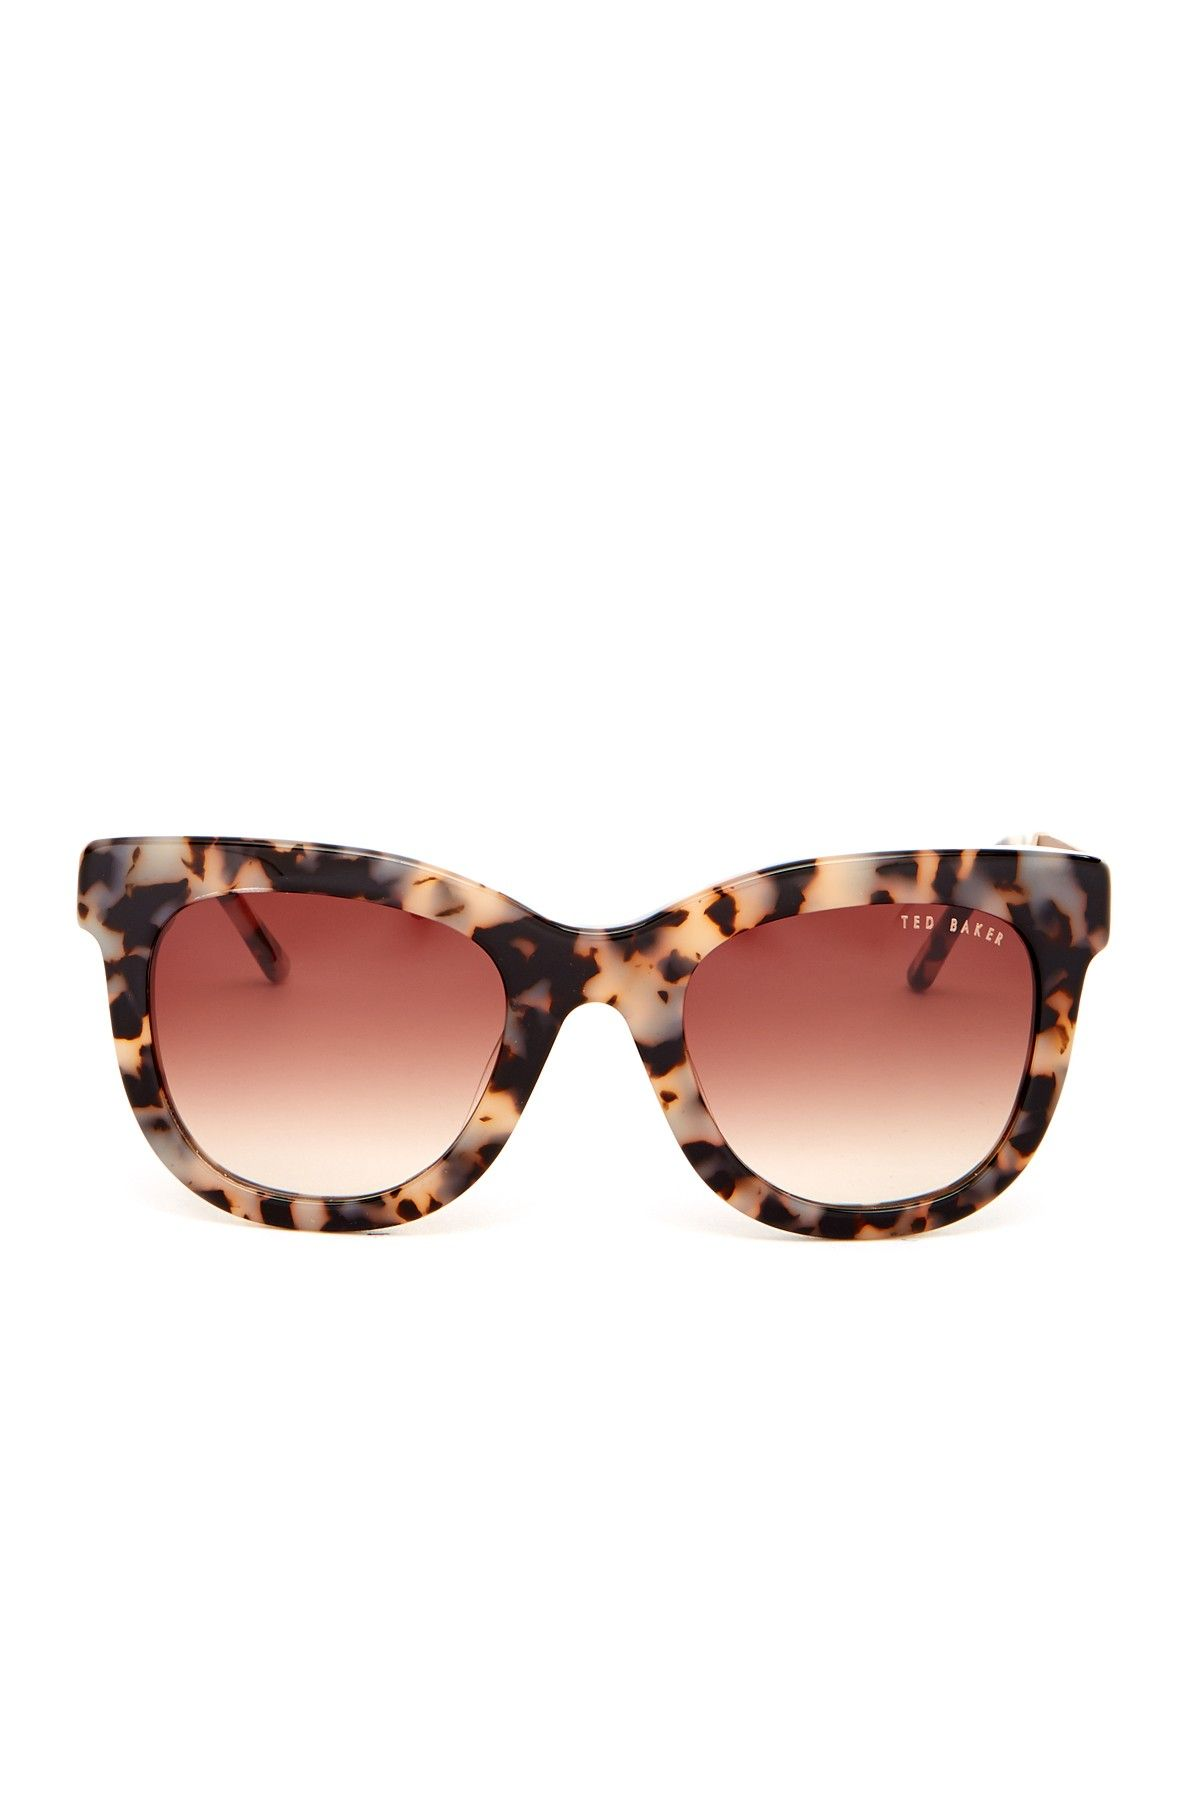 34e46a47c0c7c Women s Oversize Wayfarer Sunglasses